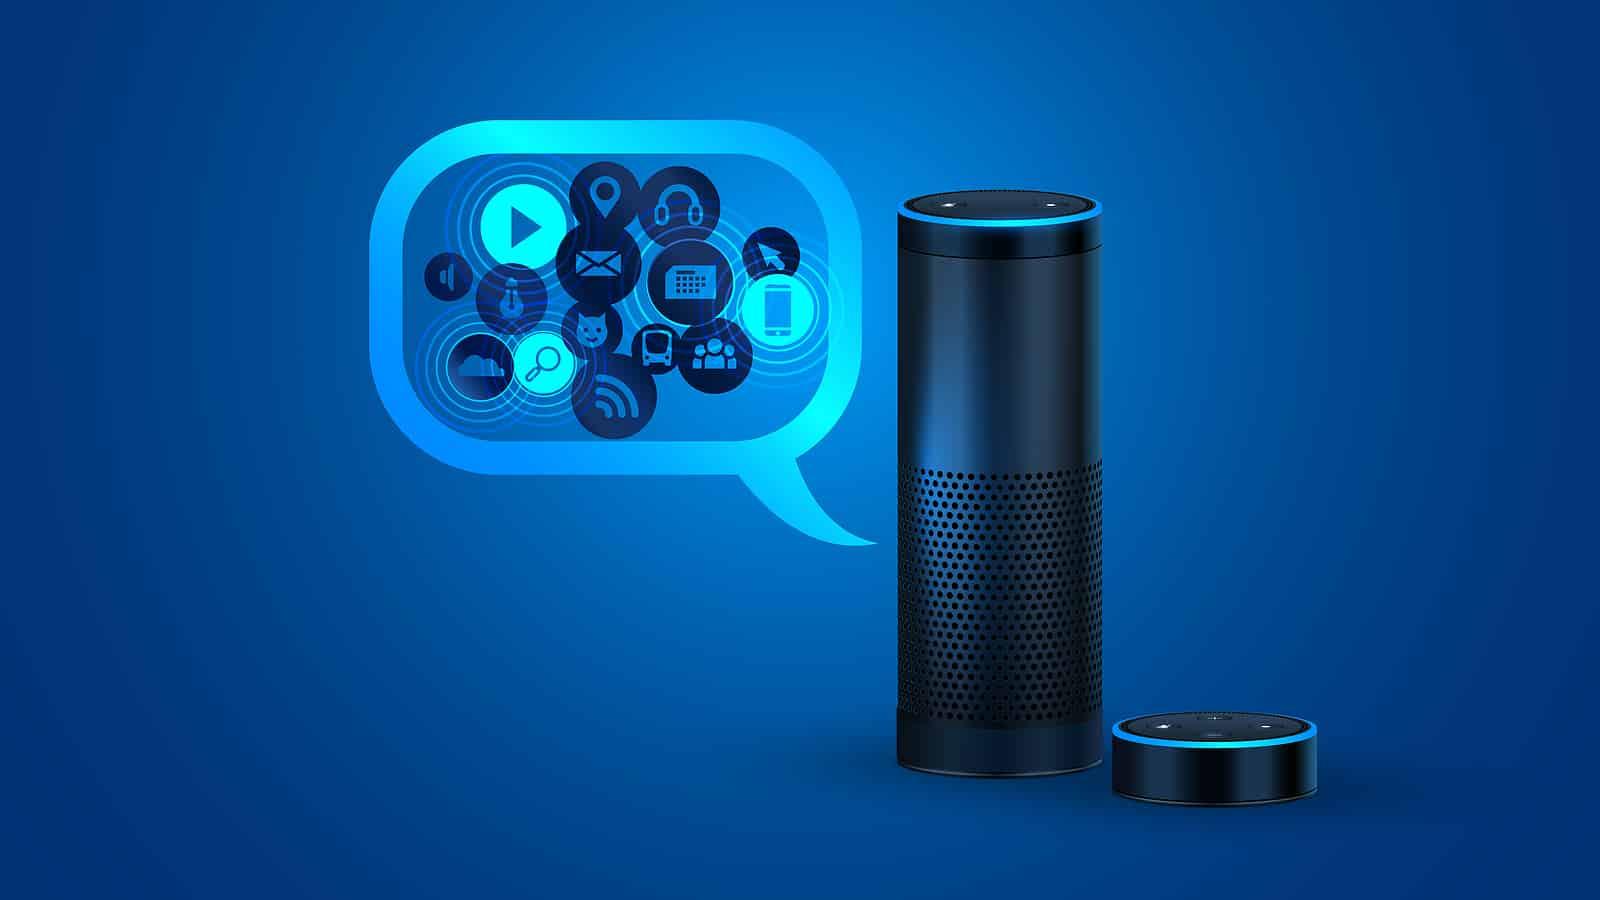 Alexa smart speaker with voice control